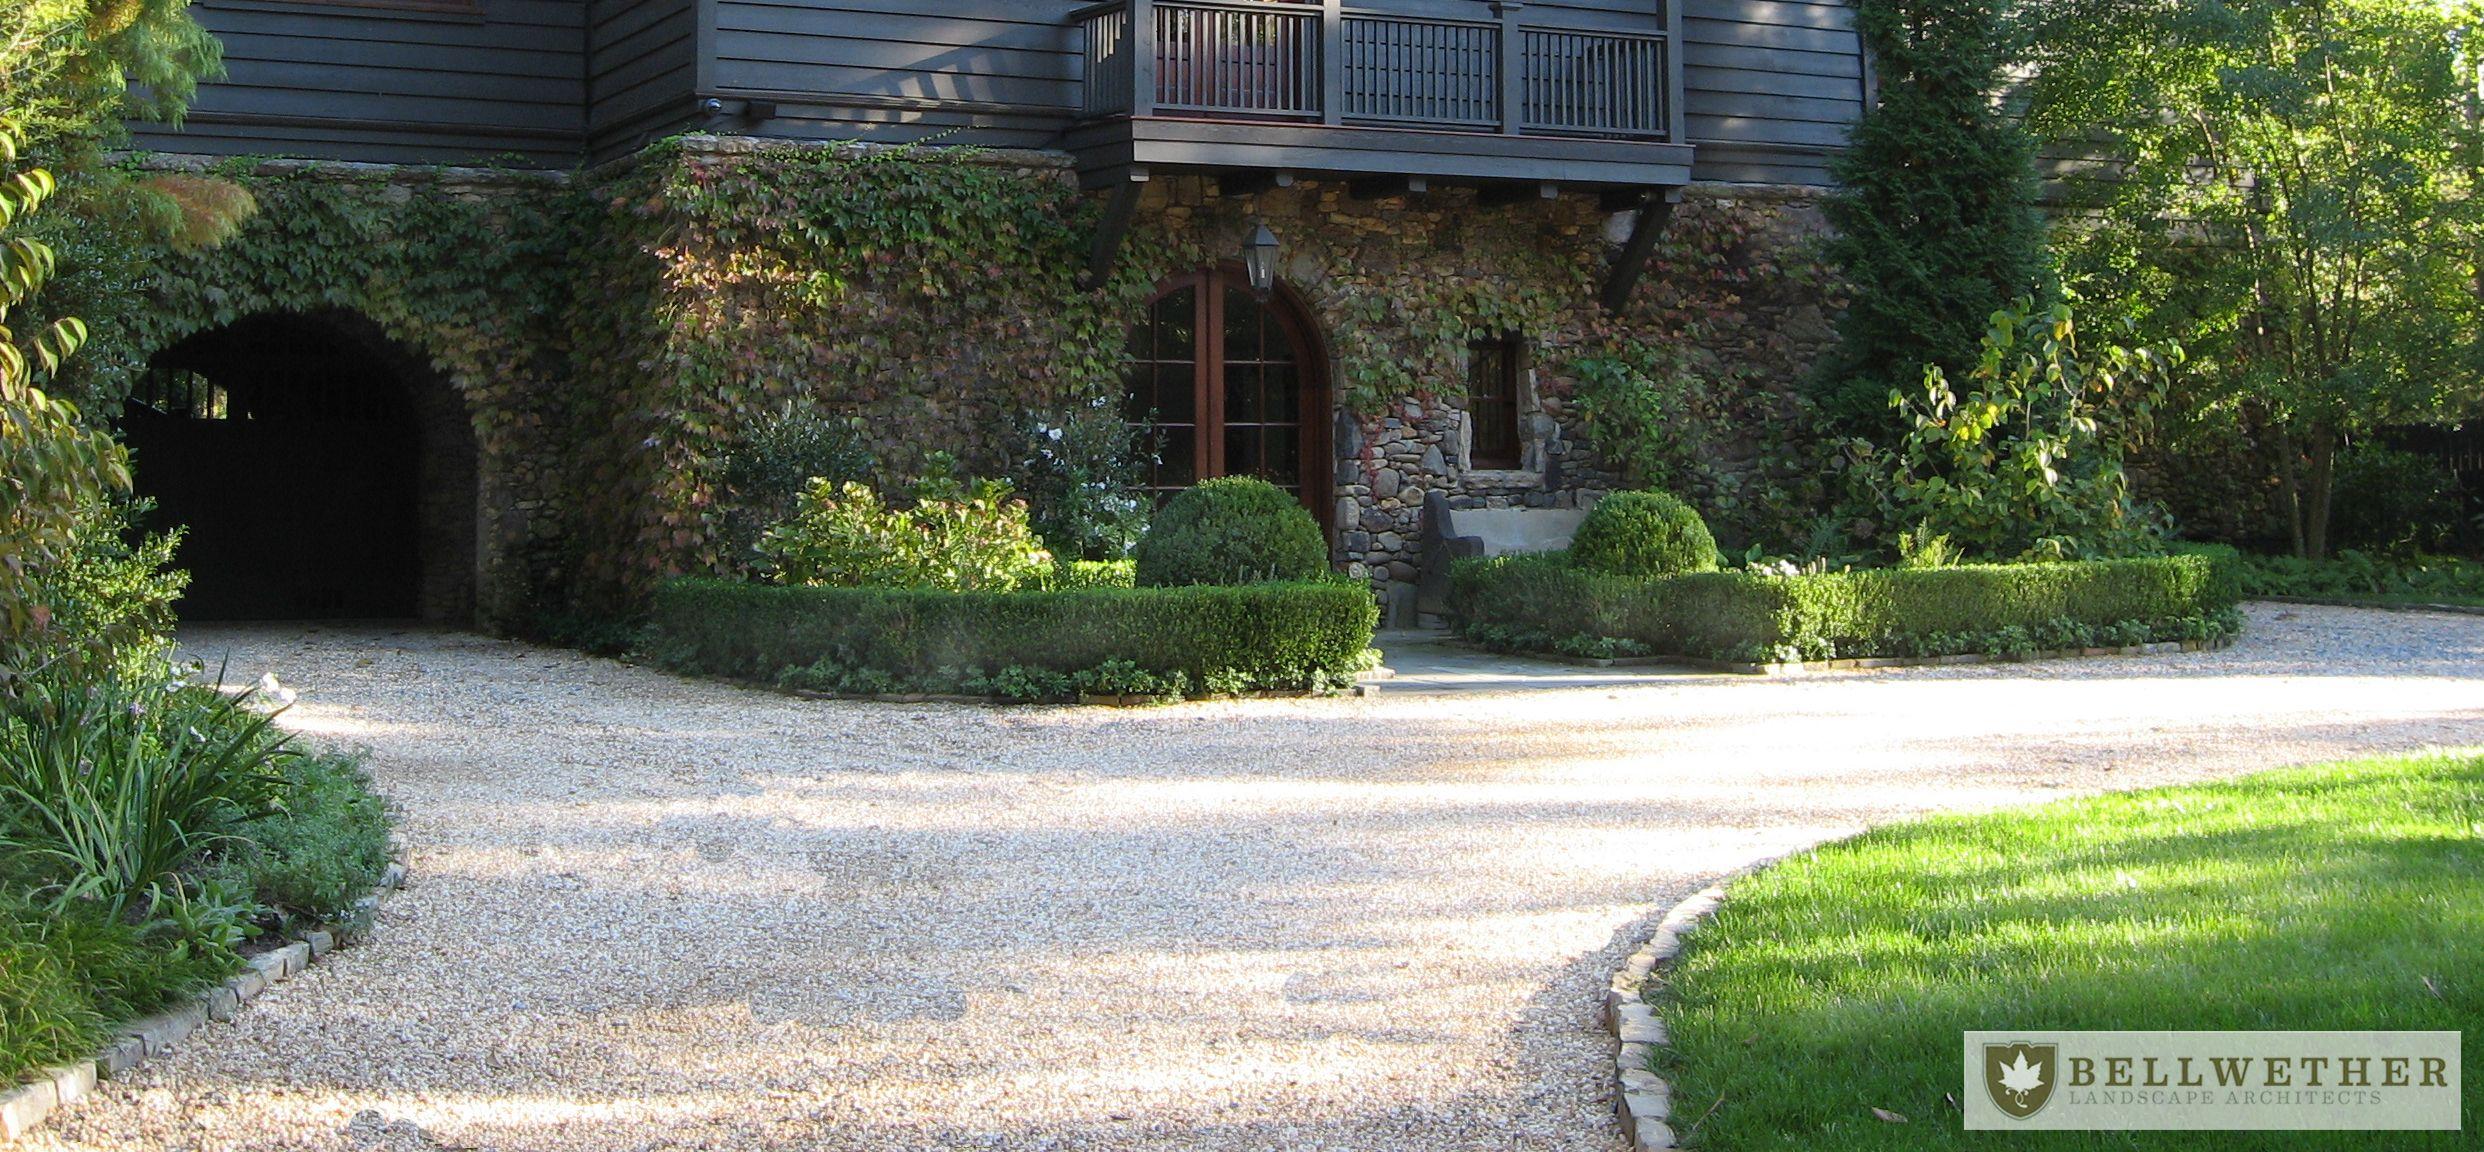 Landscape architect atlanta ga - Pea Gravel Front Entry With Boxwood Borders Bellwether Landscape Architects In Atlanta Ga